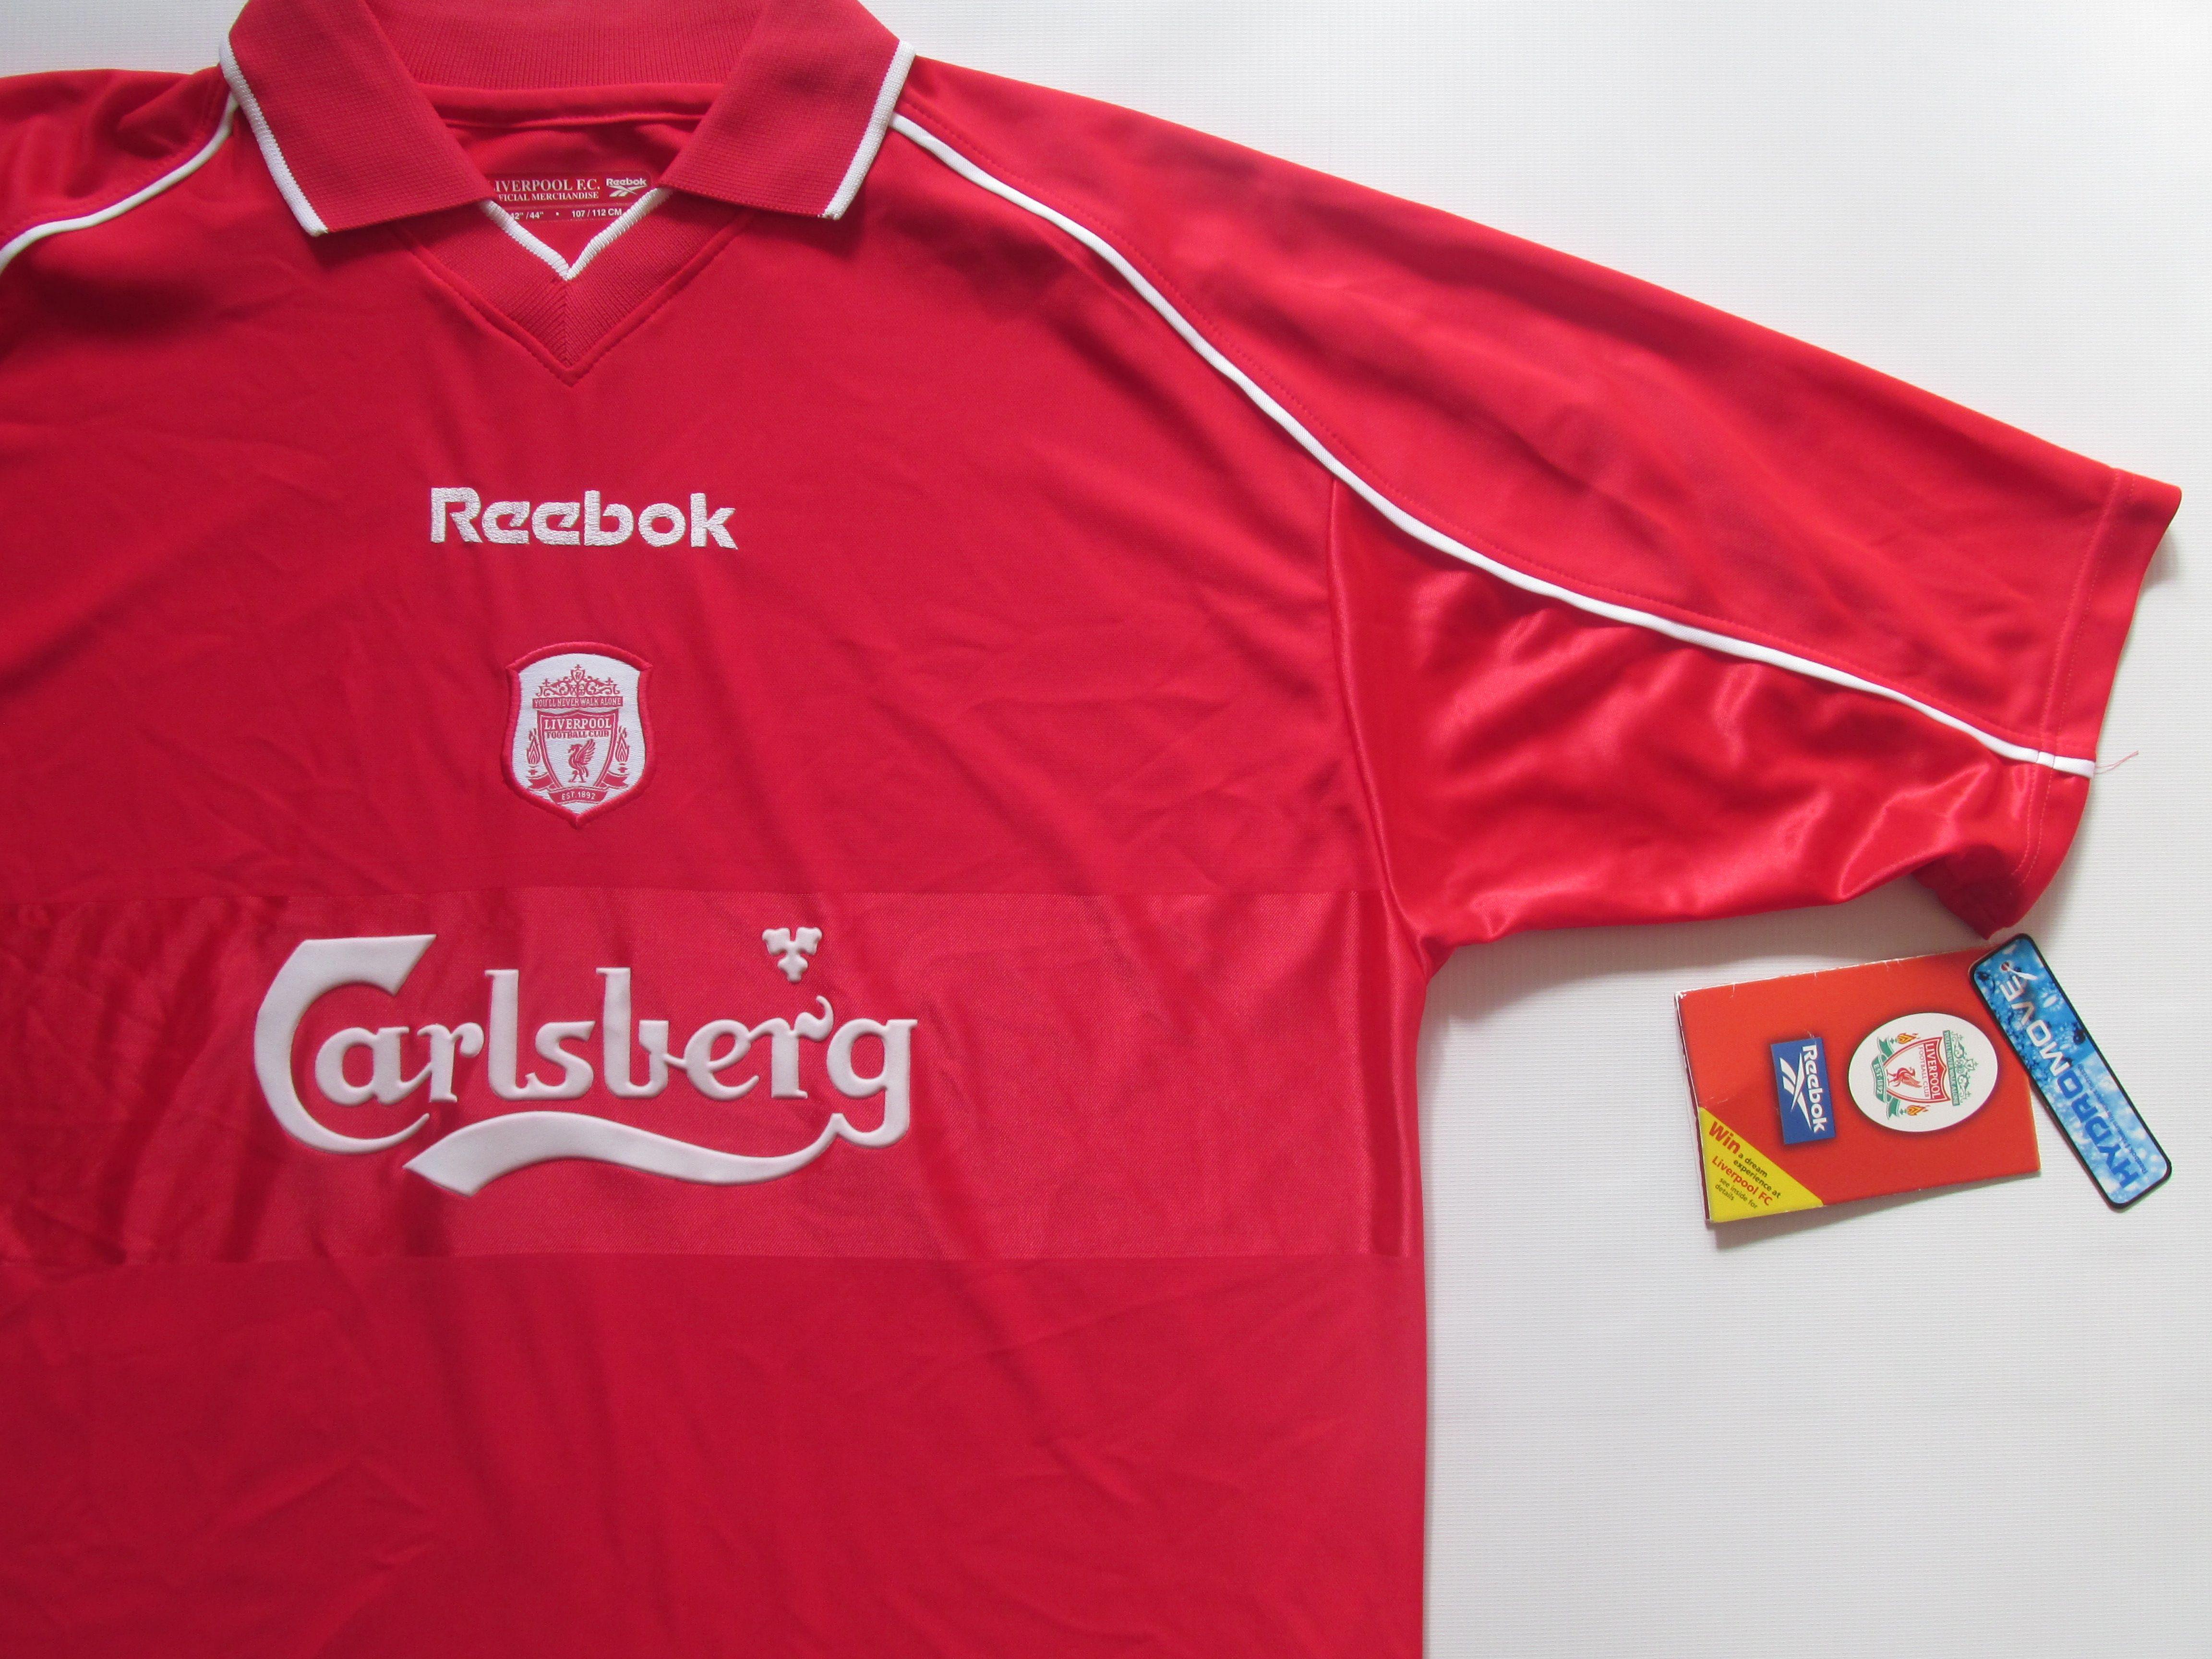 499f9648b39 Liverpool FC 2000 2001 2002 home football shirt by Reebok BNWT LFC Reds  England PremierLeague jersey vintage soccer  liverpool  ynwa  reds  LFC   anfield ...